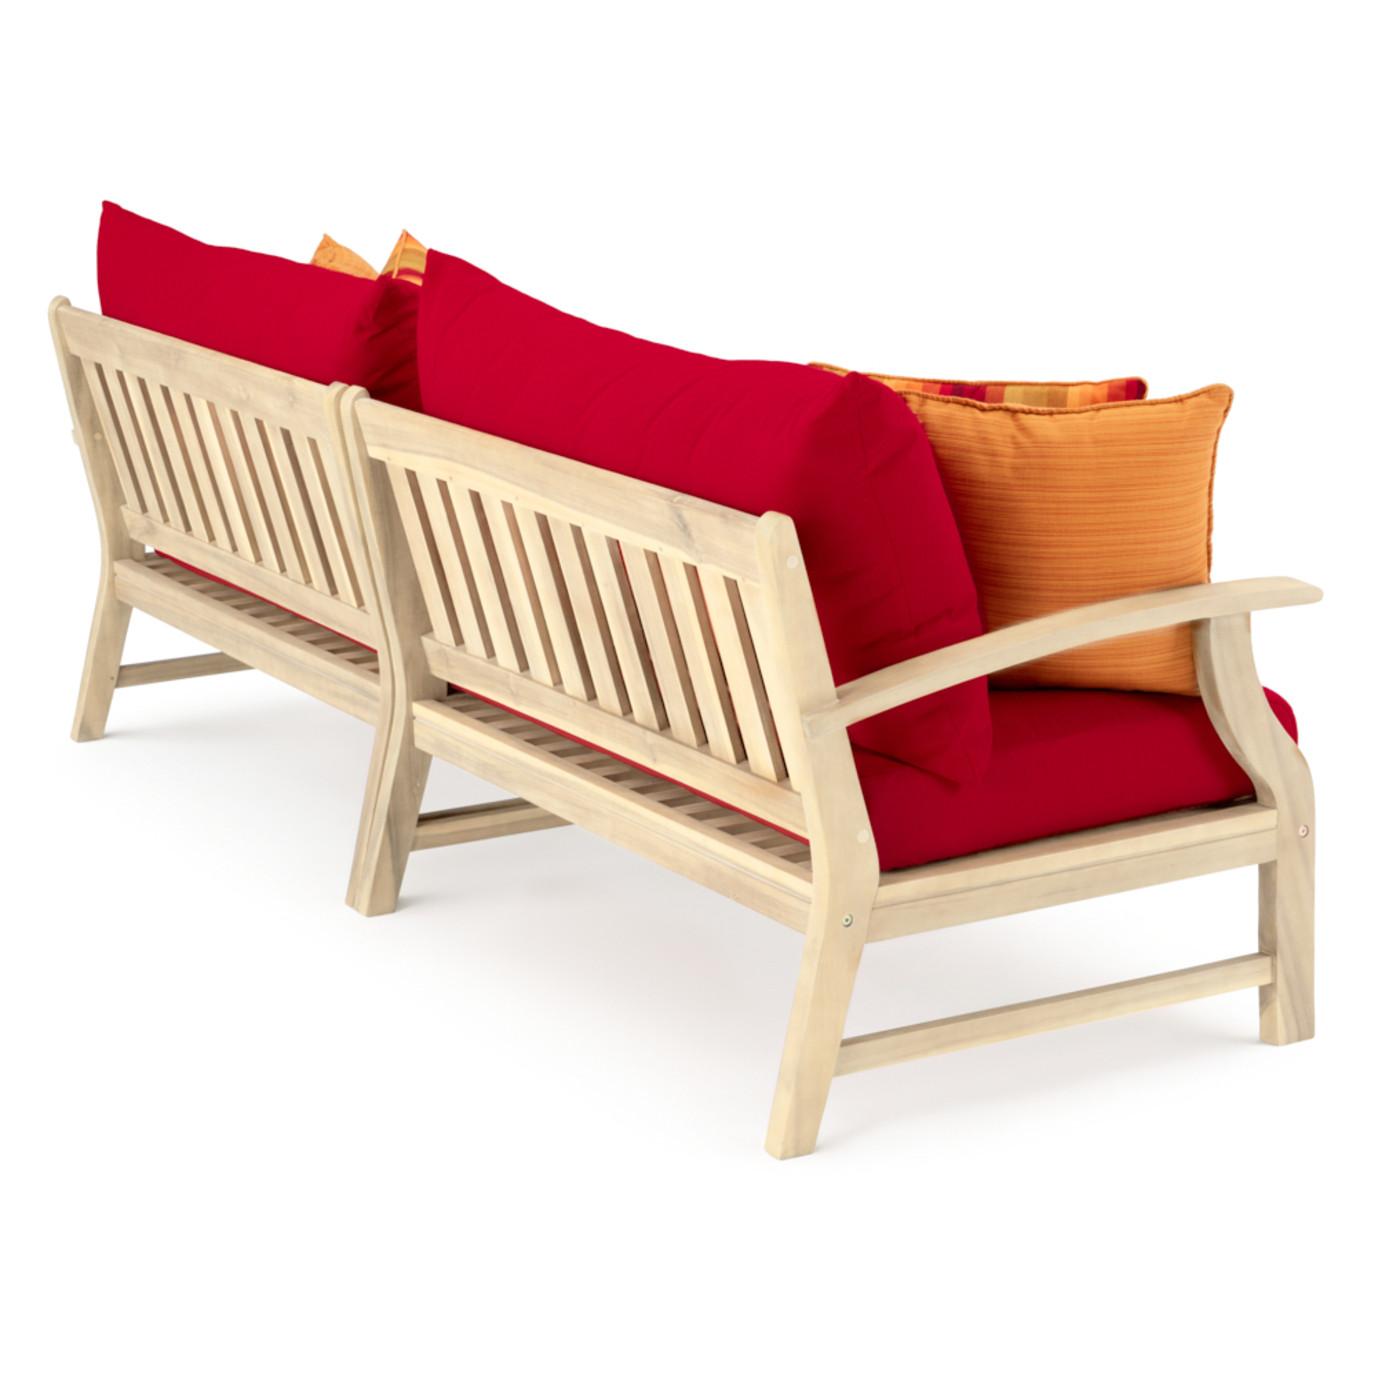 Kooper 96in Sofa - Sunset Red